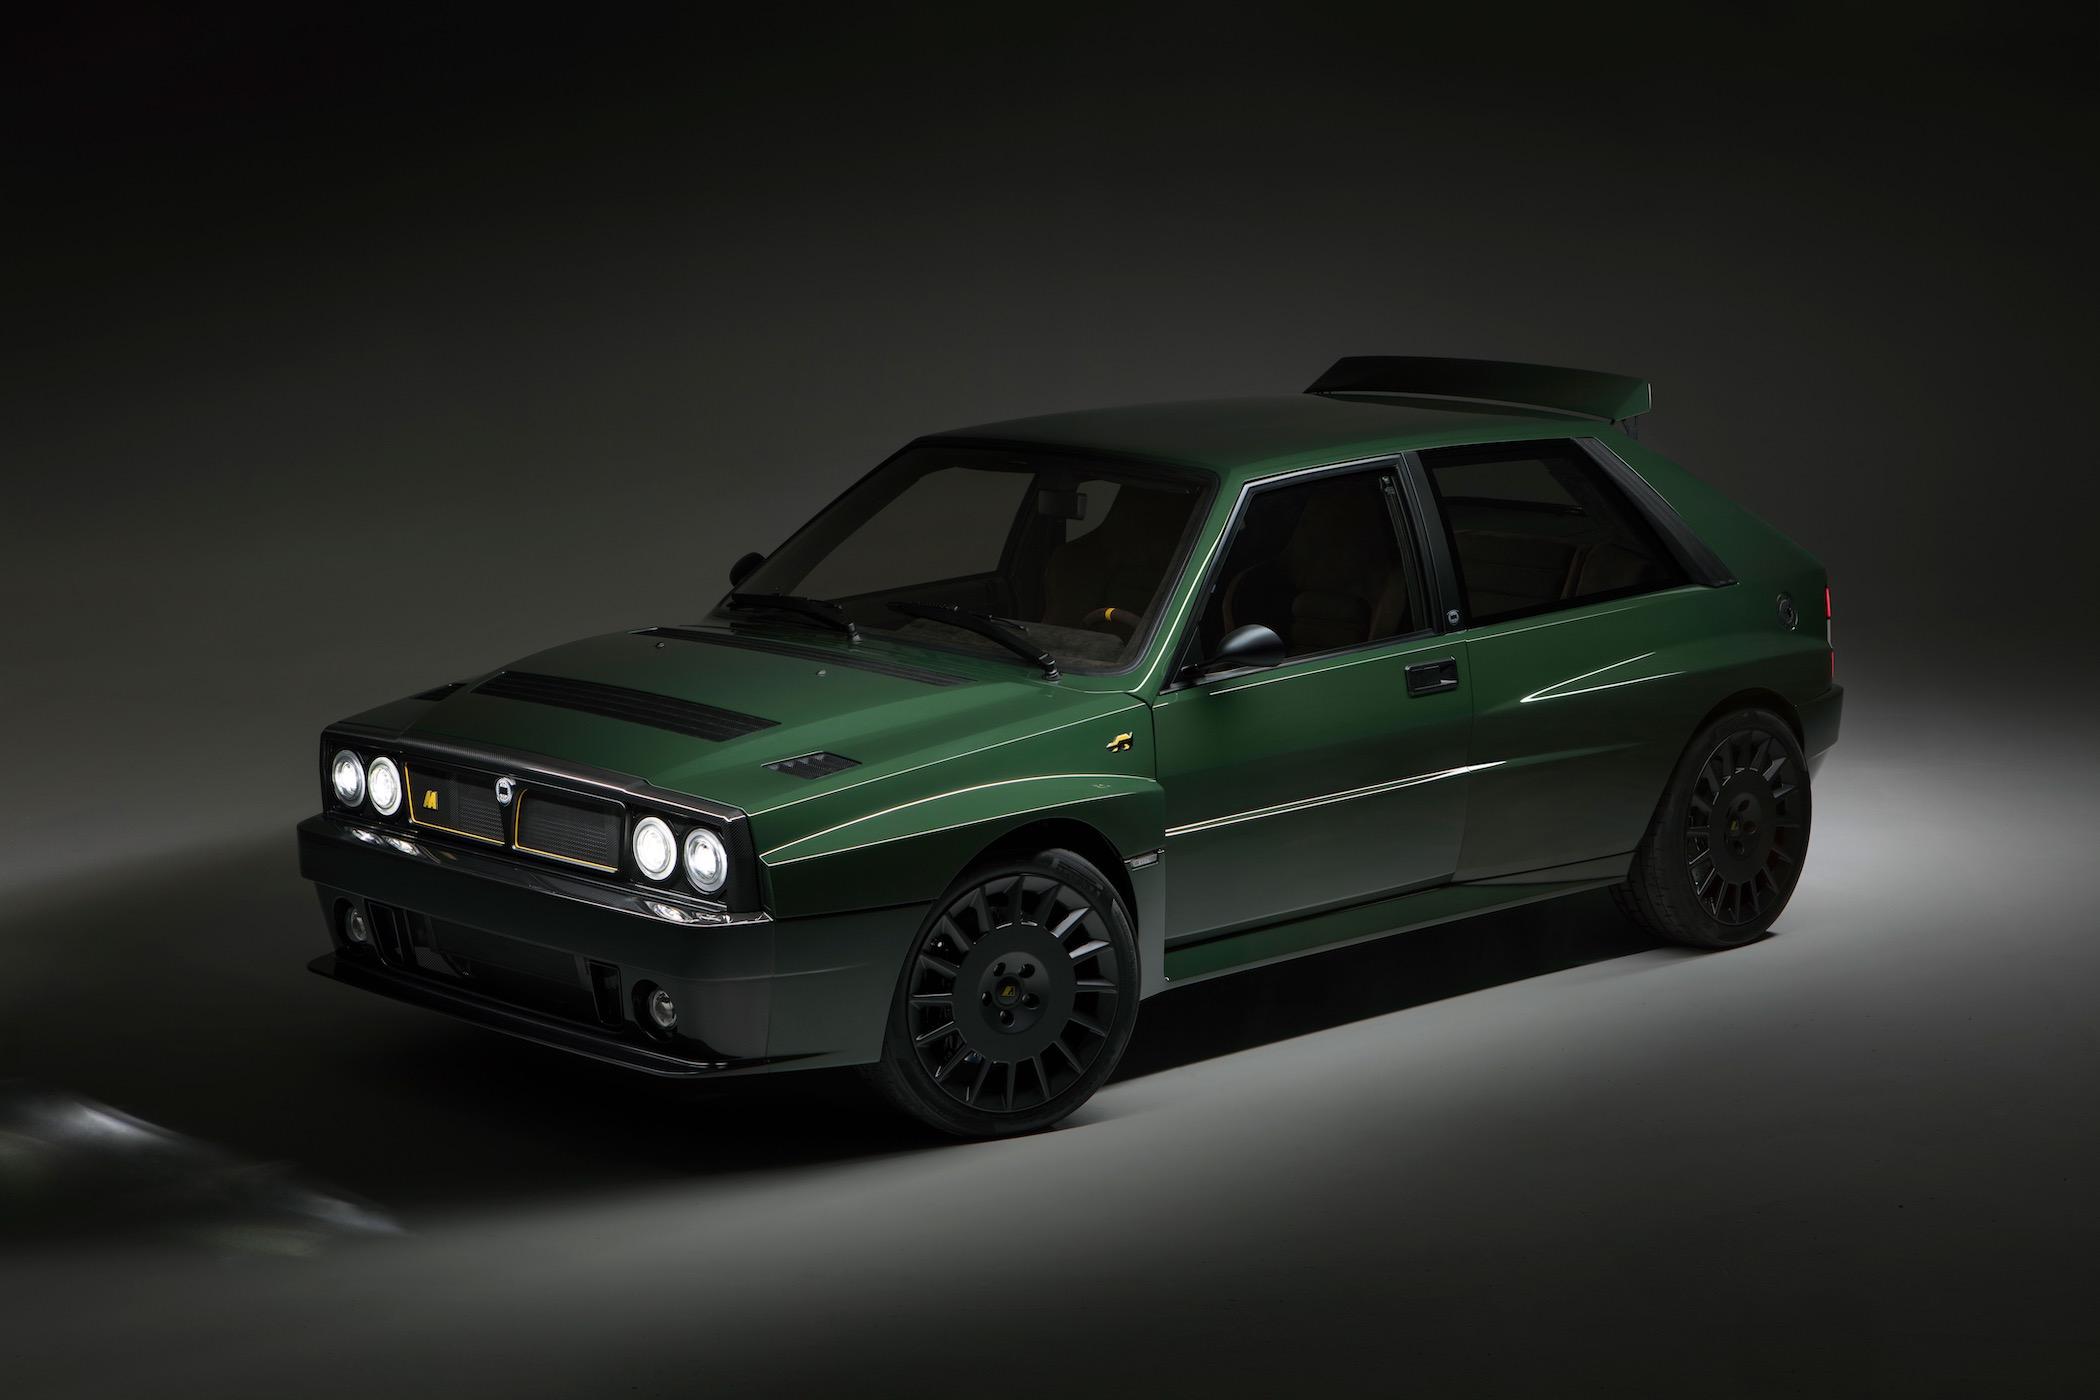 Automobili Amos Lancia Delta Futurista - Ressence - 2